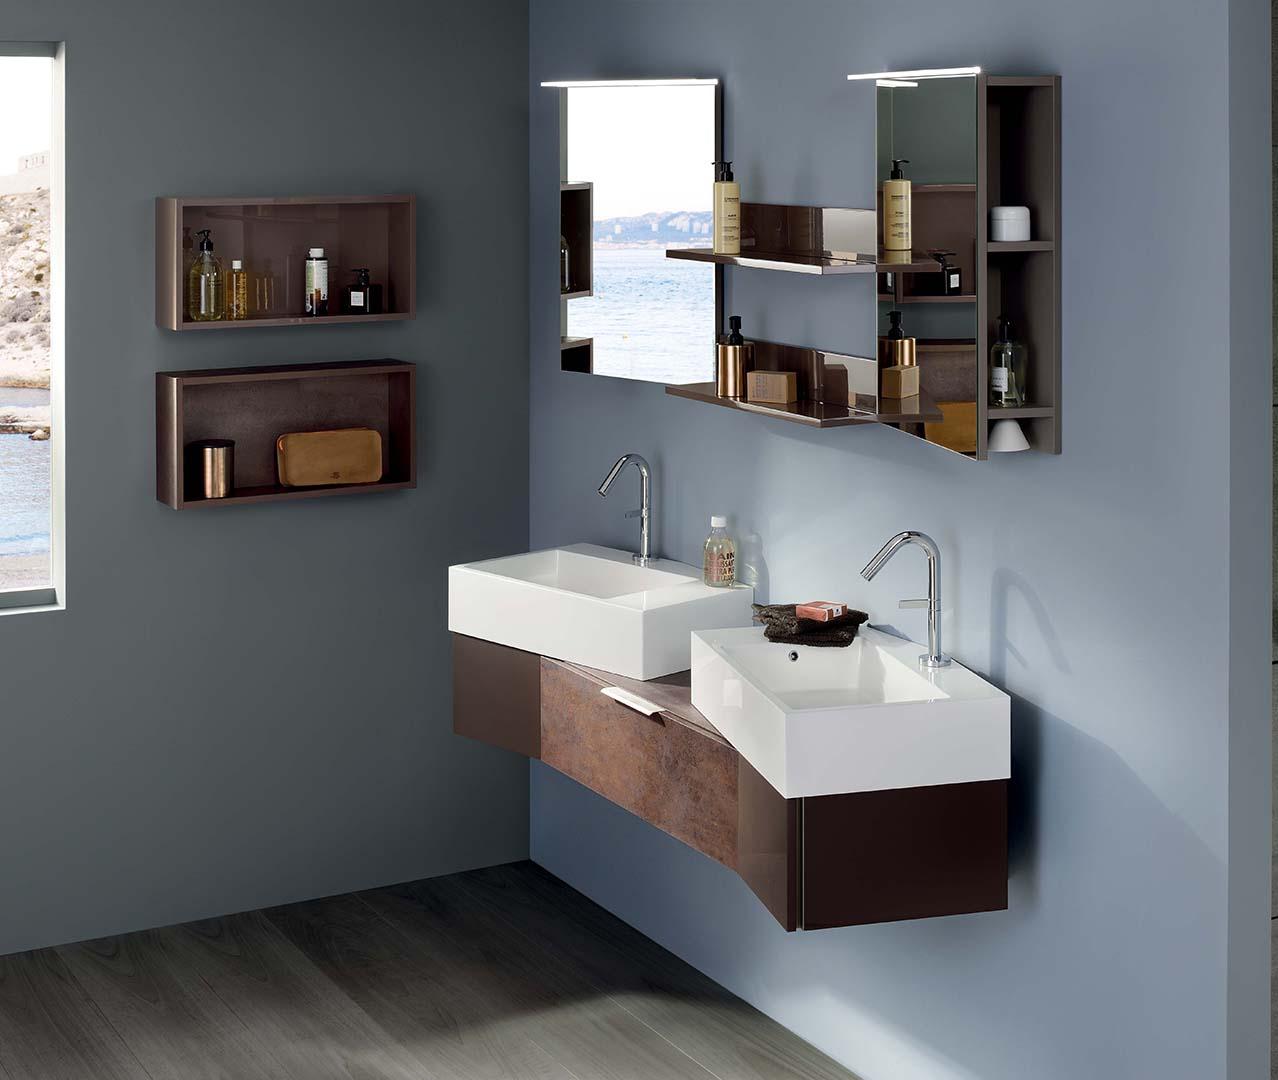 gamme vertigo salle de bain design meuble sdb sanijura. Black Bedroom Furniture Sets. Home Design Ideas